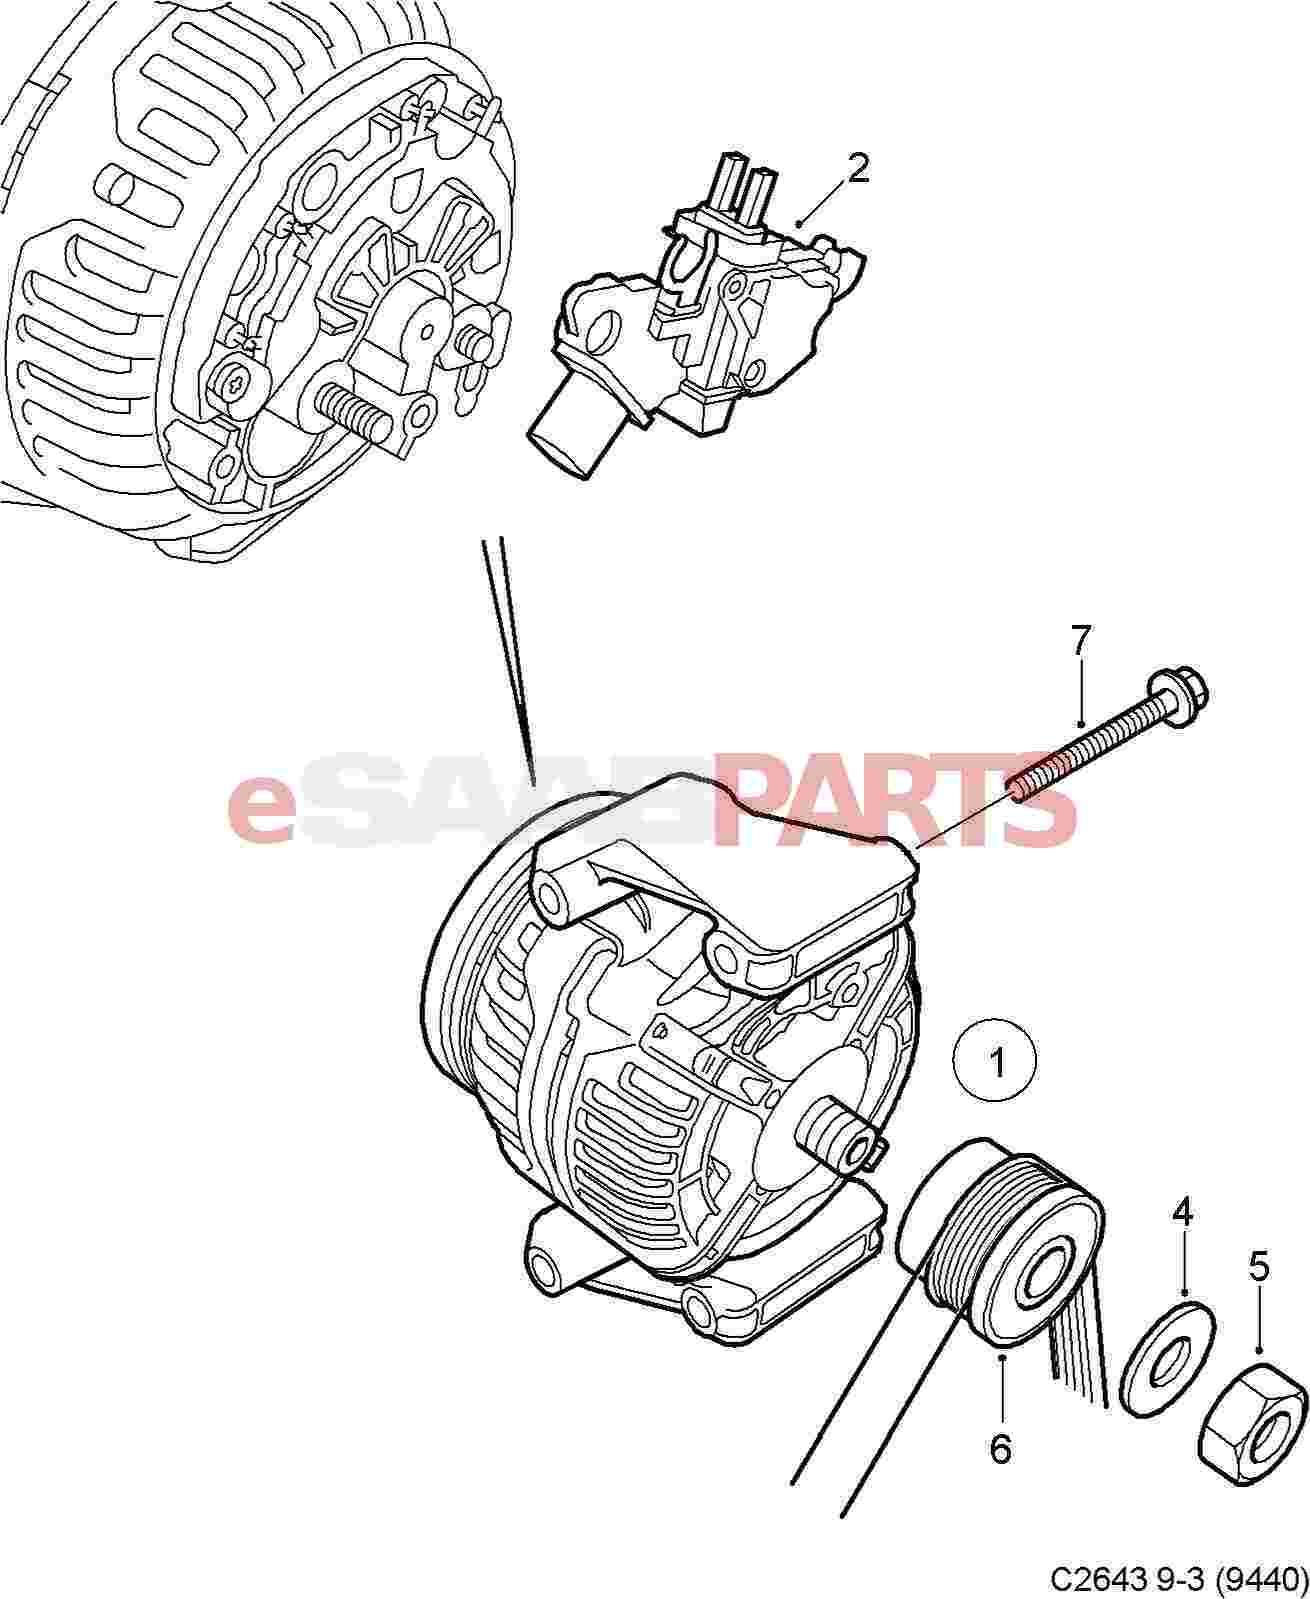 80756 esaabparts com saab 9 3 (9440) \u003e electrical parts \u003e alternator